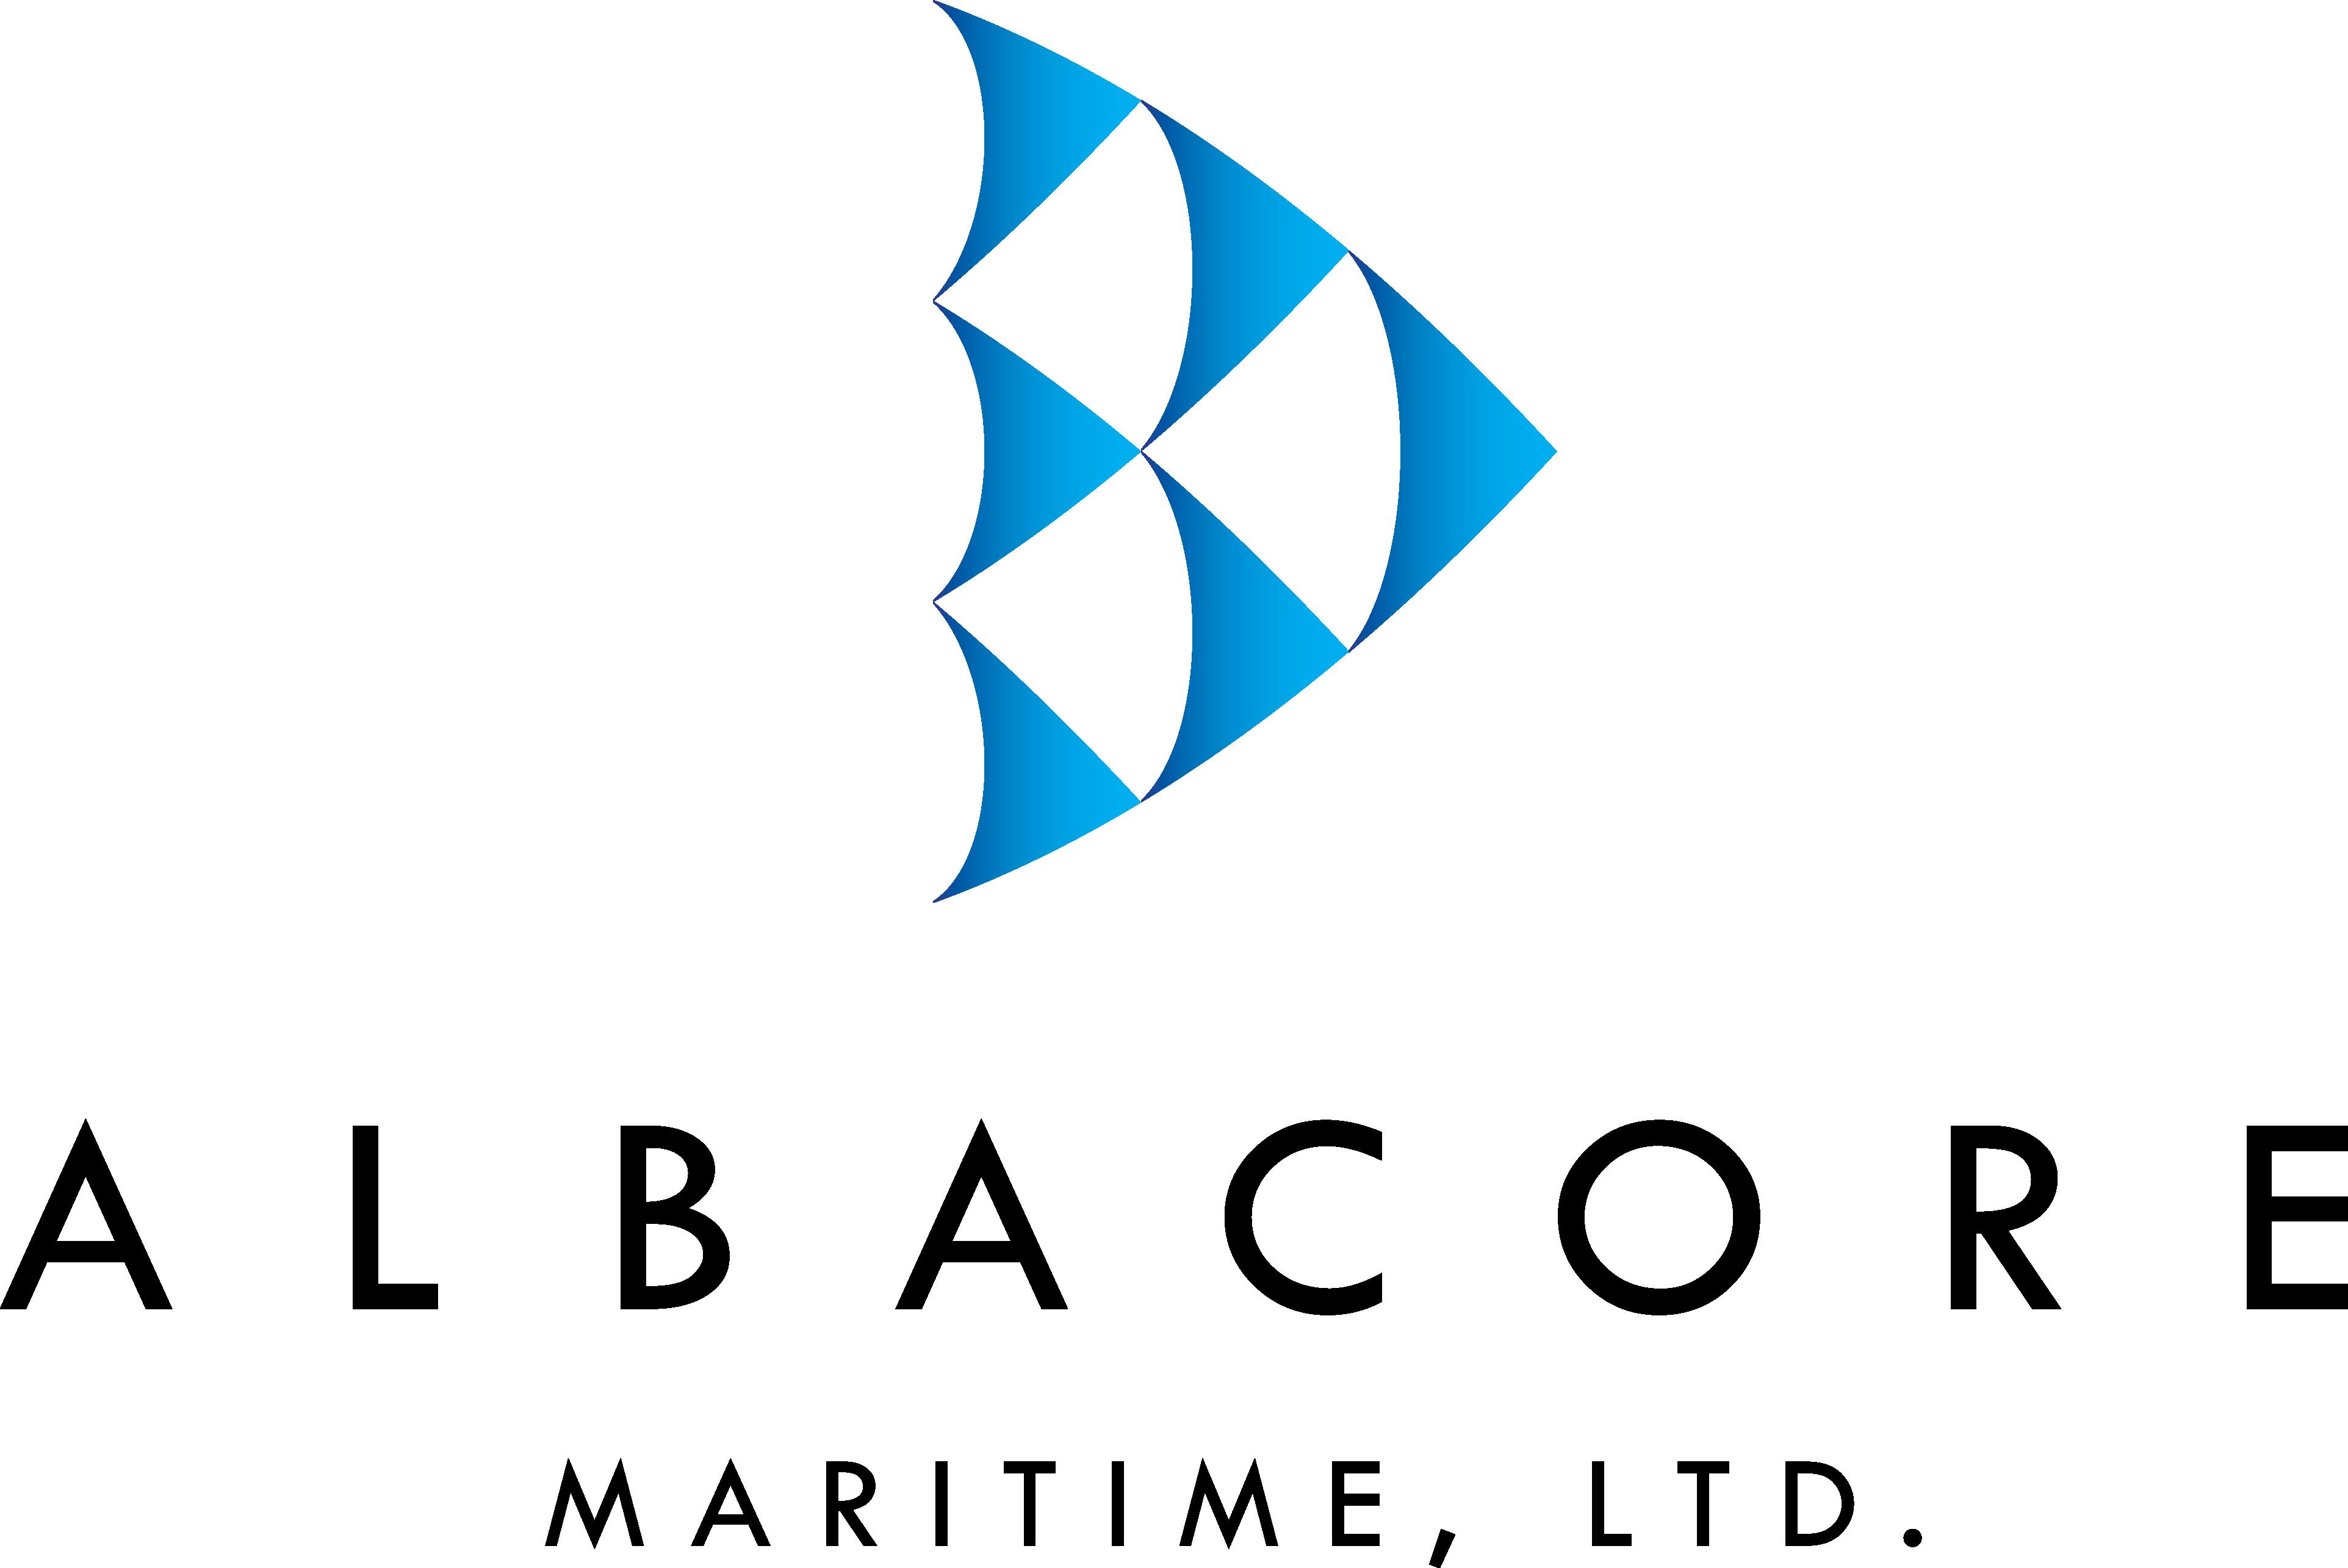 Albacore Maritime